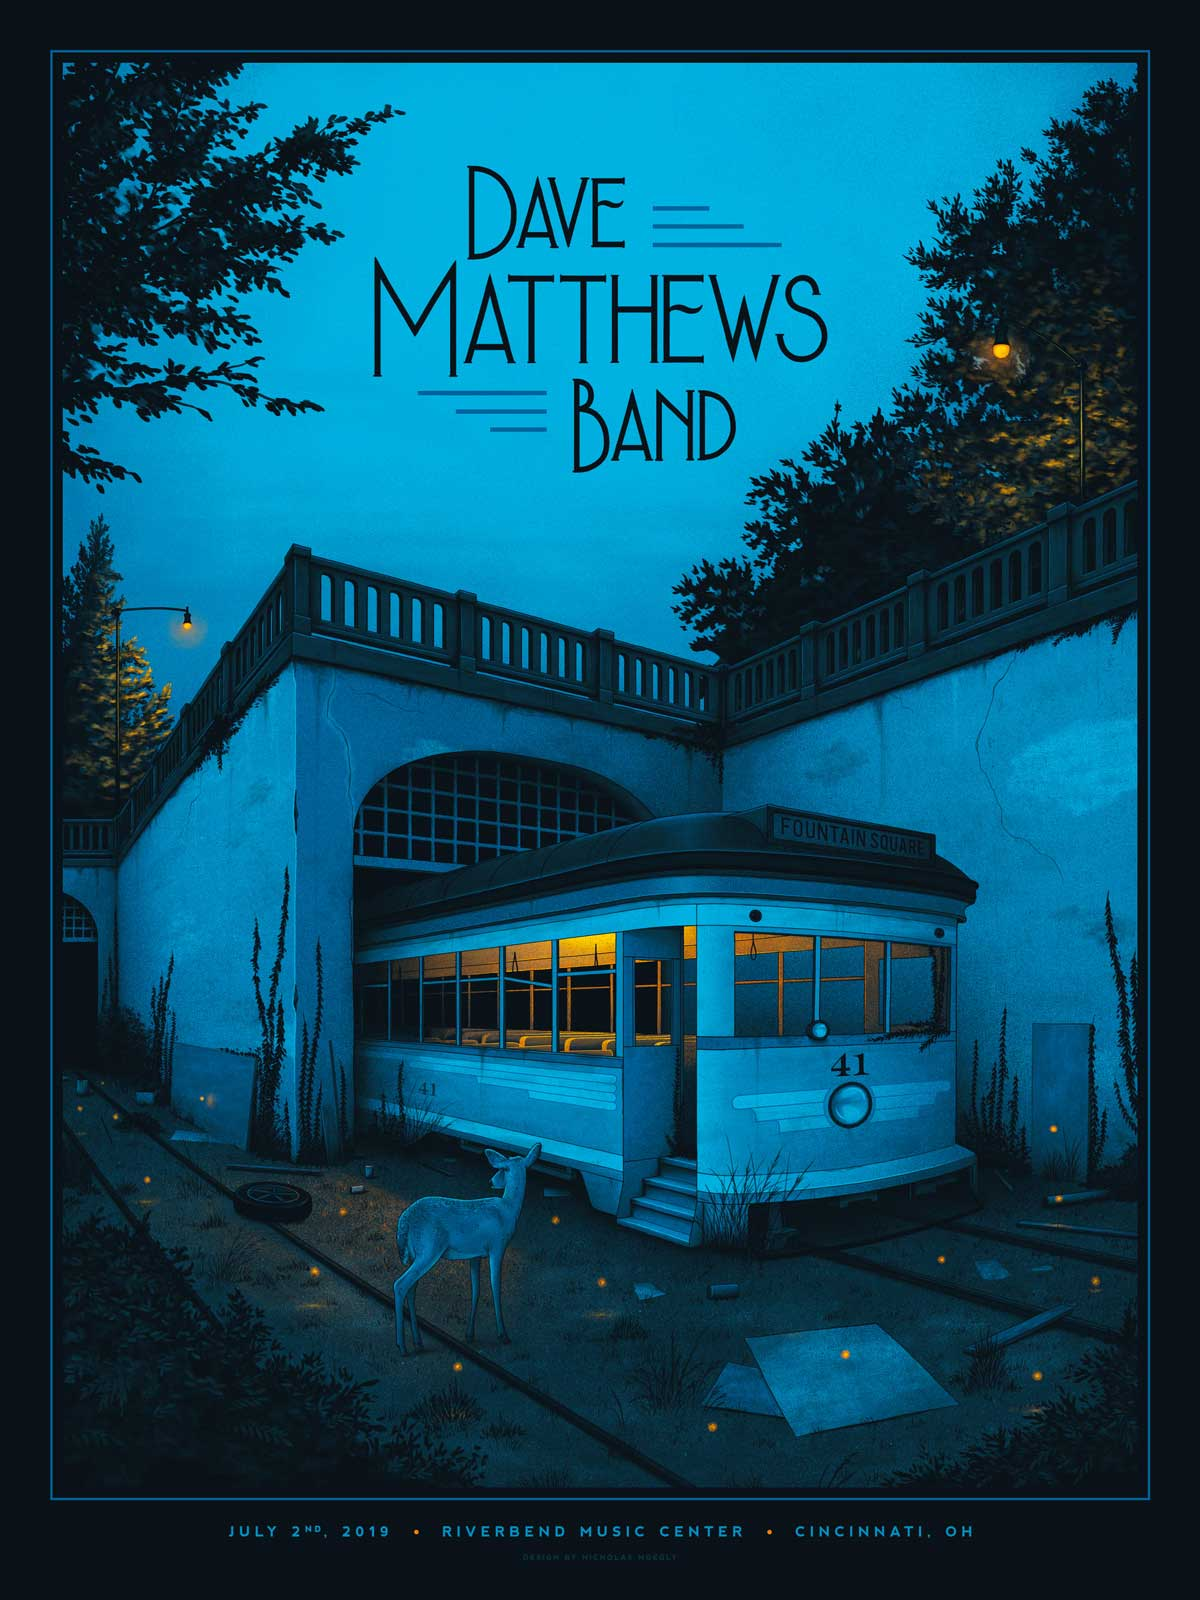 Illustrierte Konzert-Plakate von Nicholas Moegly gig-posters-Nicholas-Moegly_05